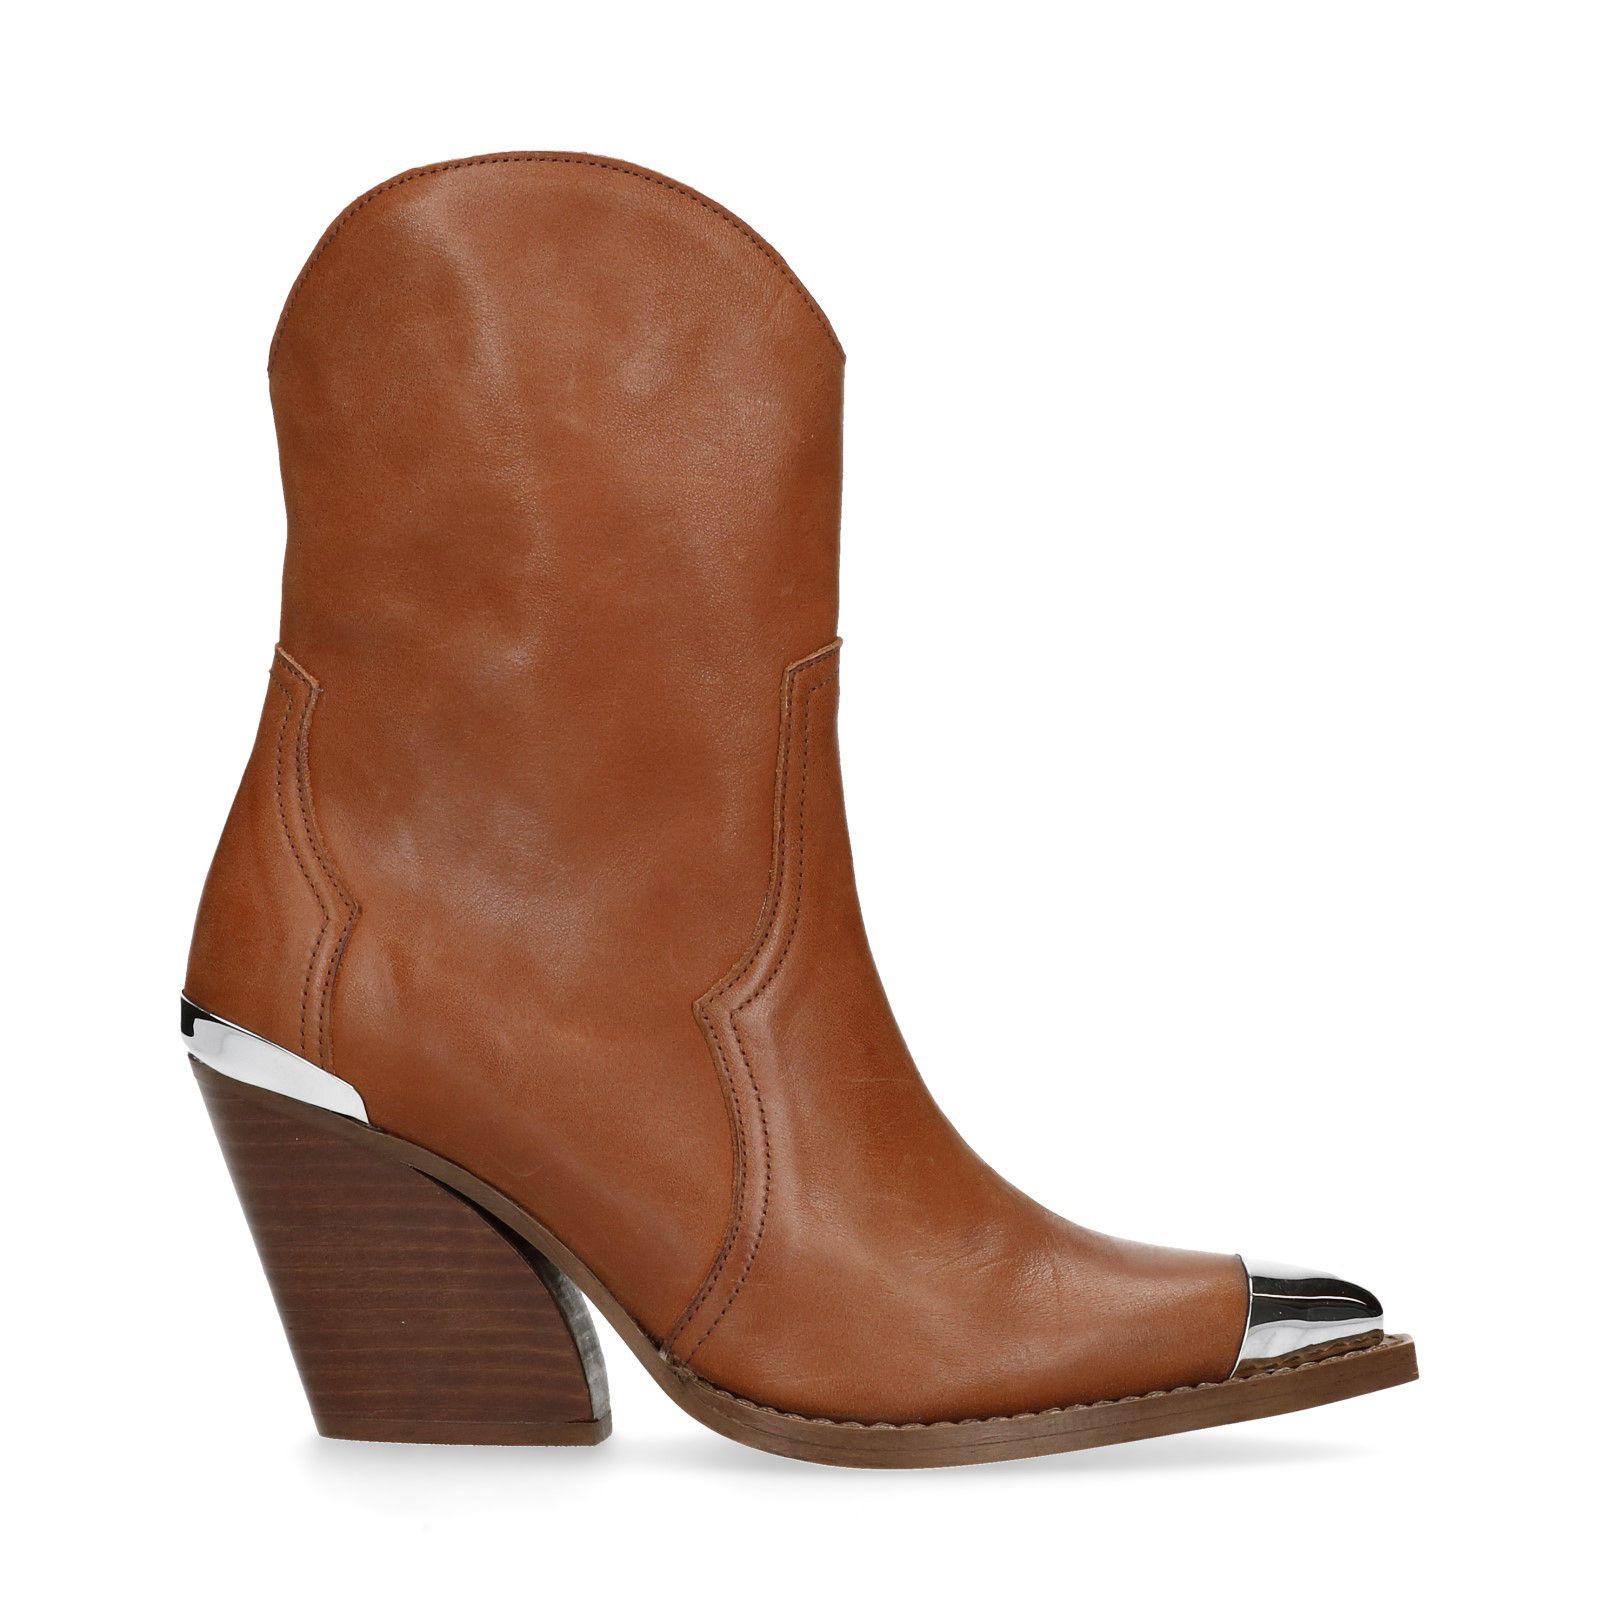 boots boots boots SACHA boots SACHA TrendWestern SACHA SACHA TrendWestern boots SACHA TrendWestern TrendWestern TrendWestern TrendWestern cK1lFTJ